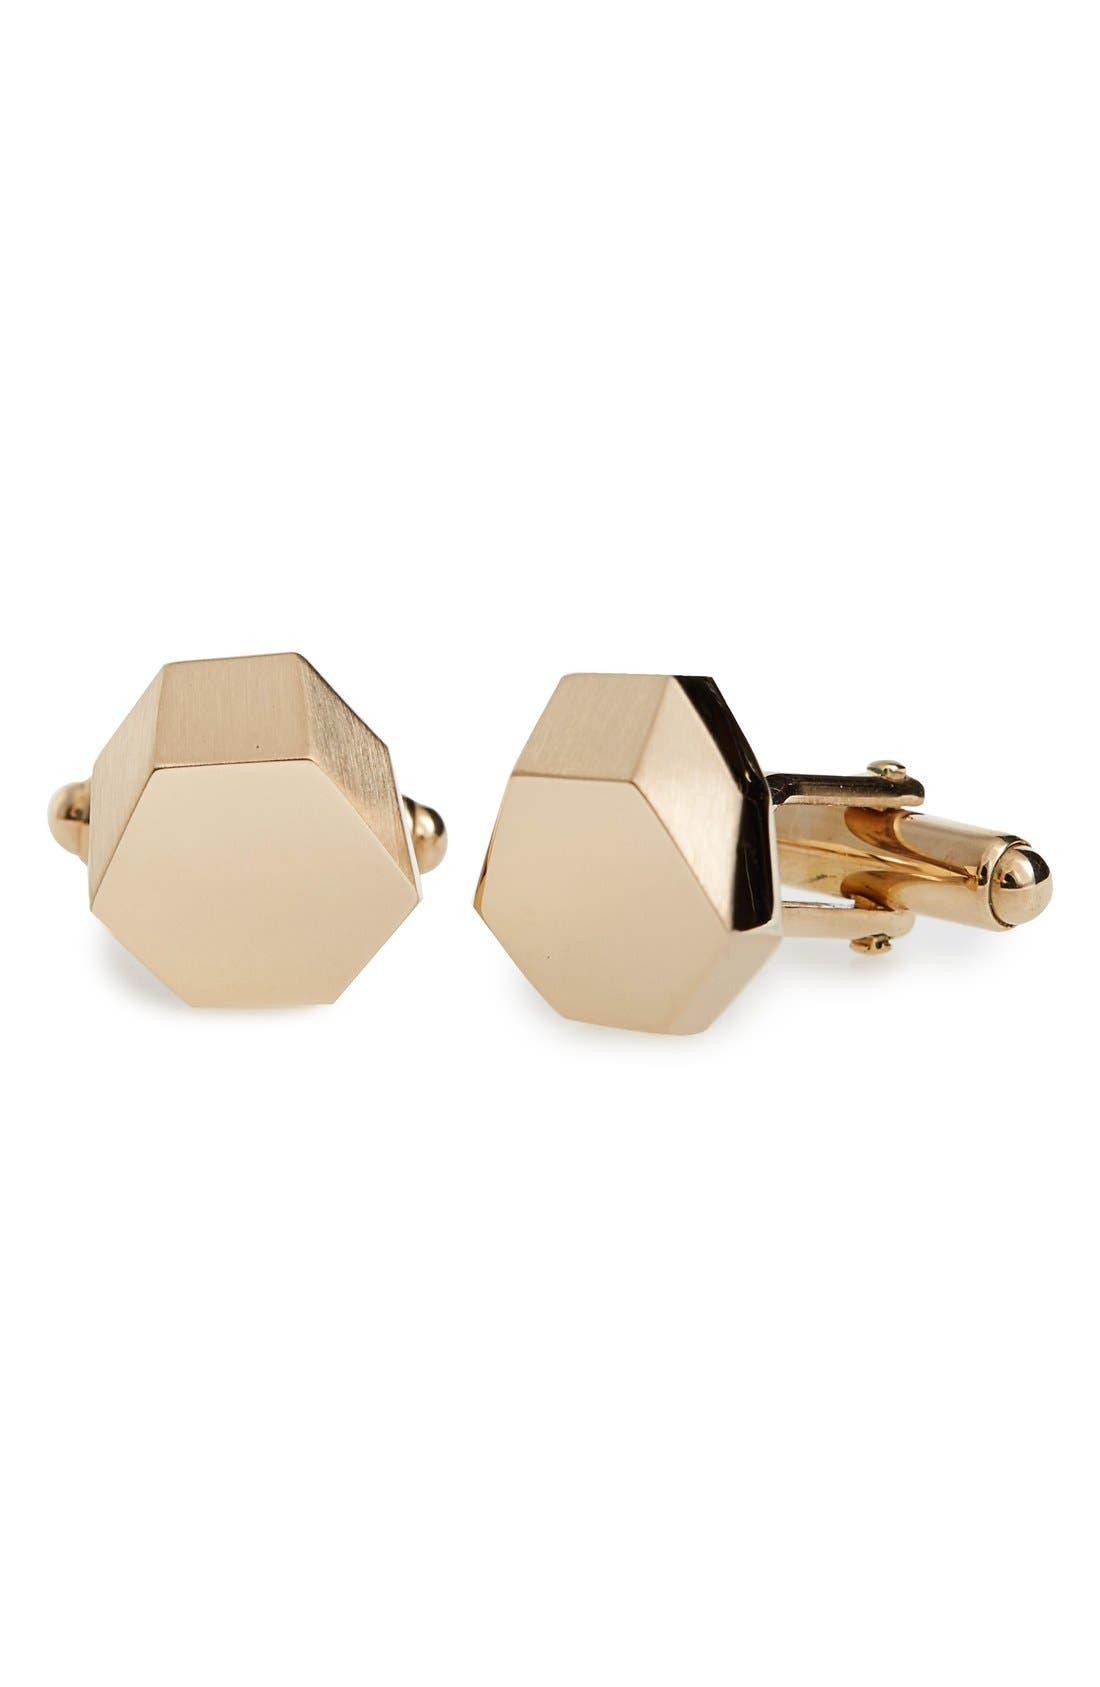 Lanvin Hexagonal Metal Cuff Links